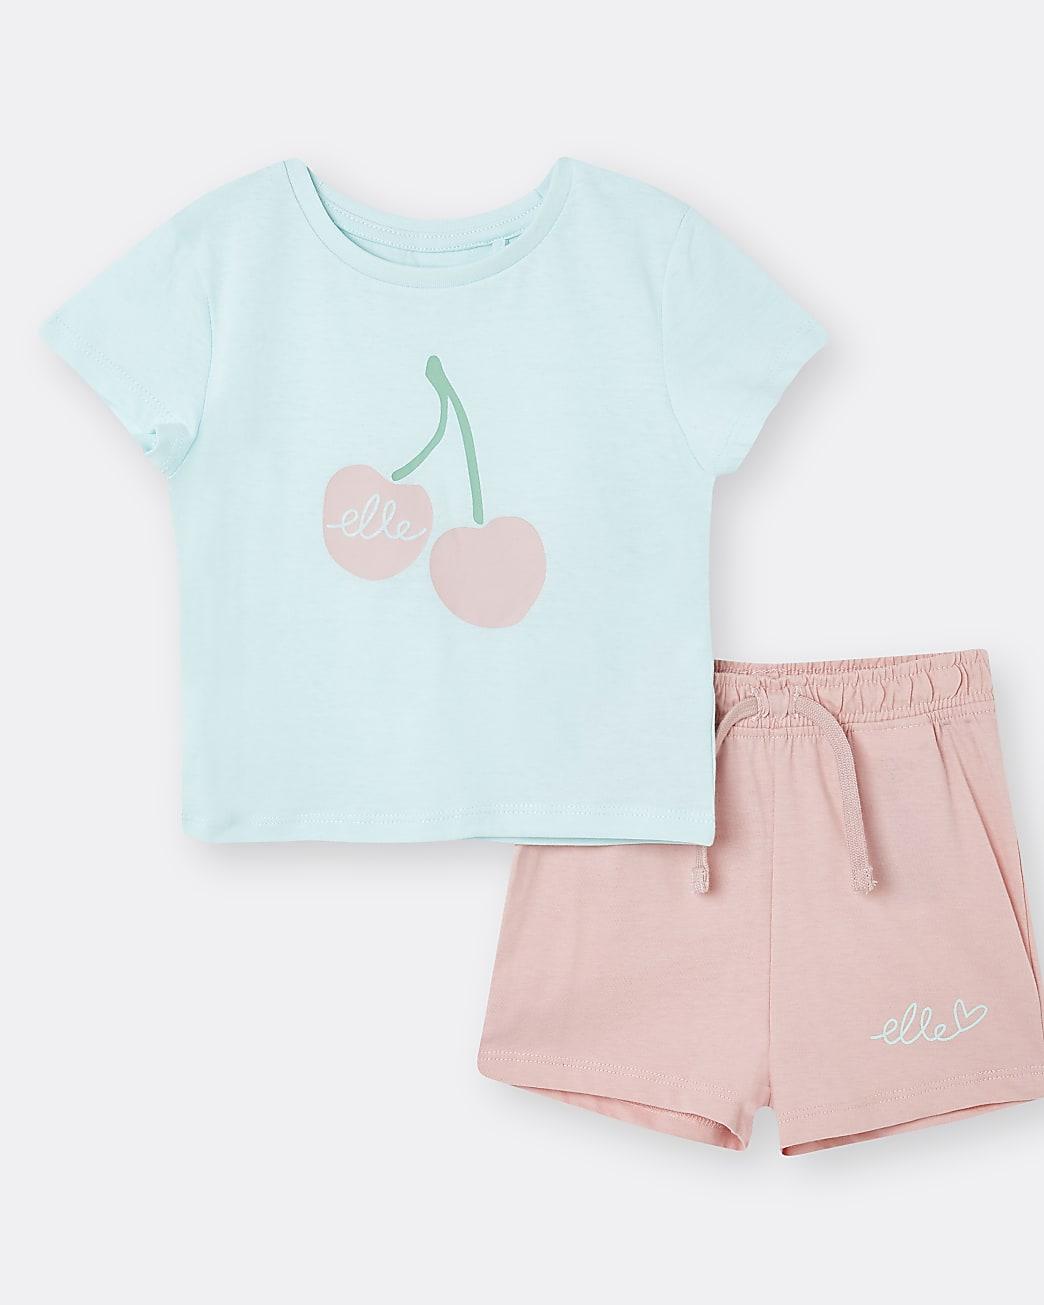 Mini girls blue ELLE t-shirt outfit